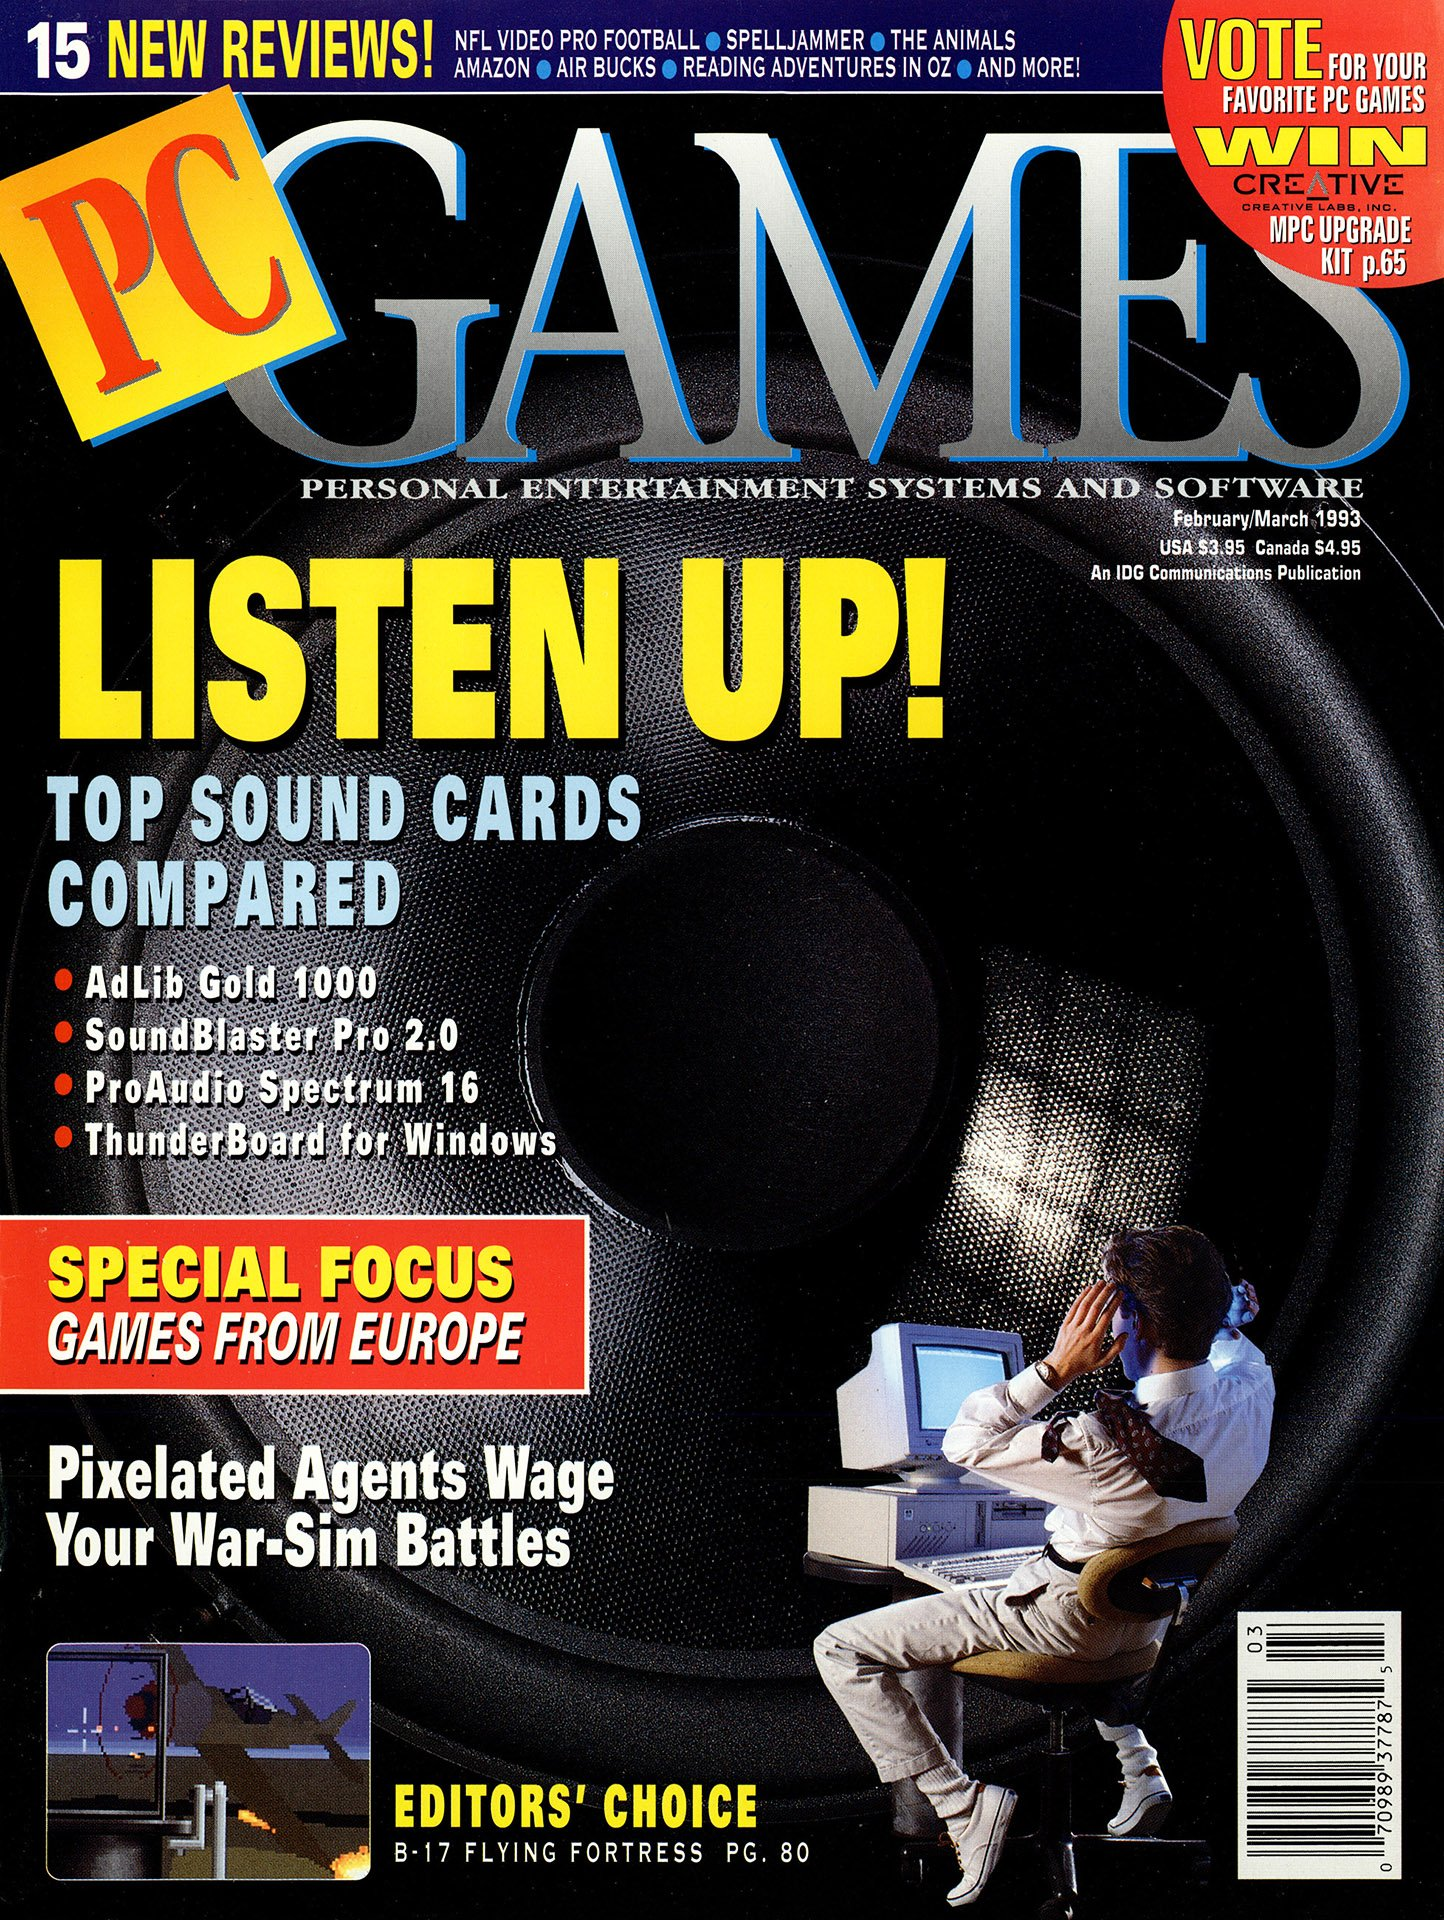 PCGames - Video Game Magazines - Retromags Community